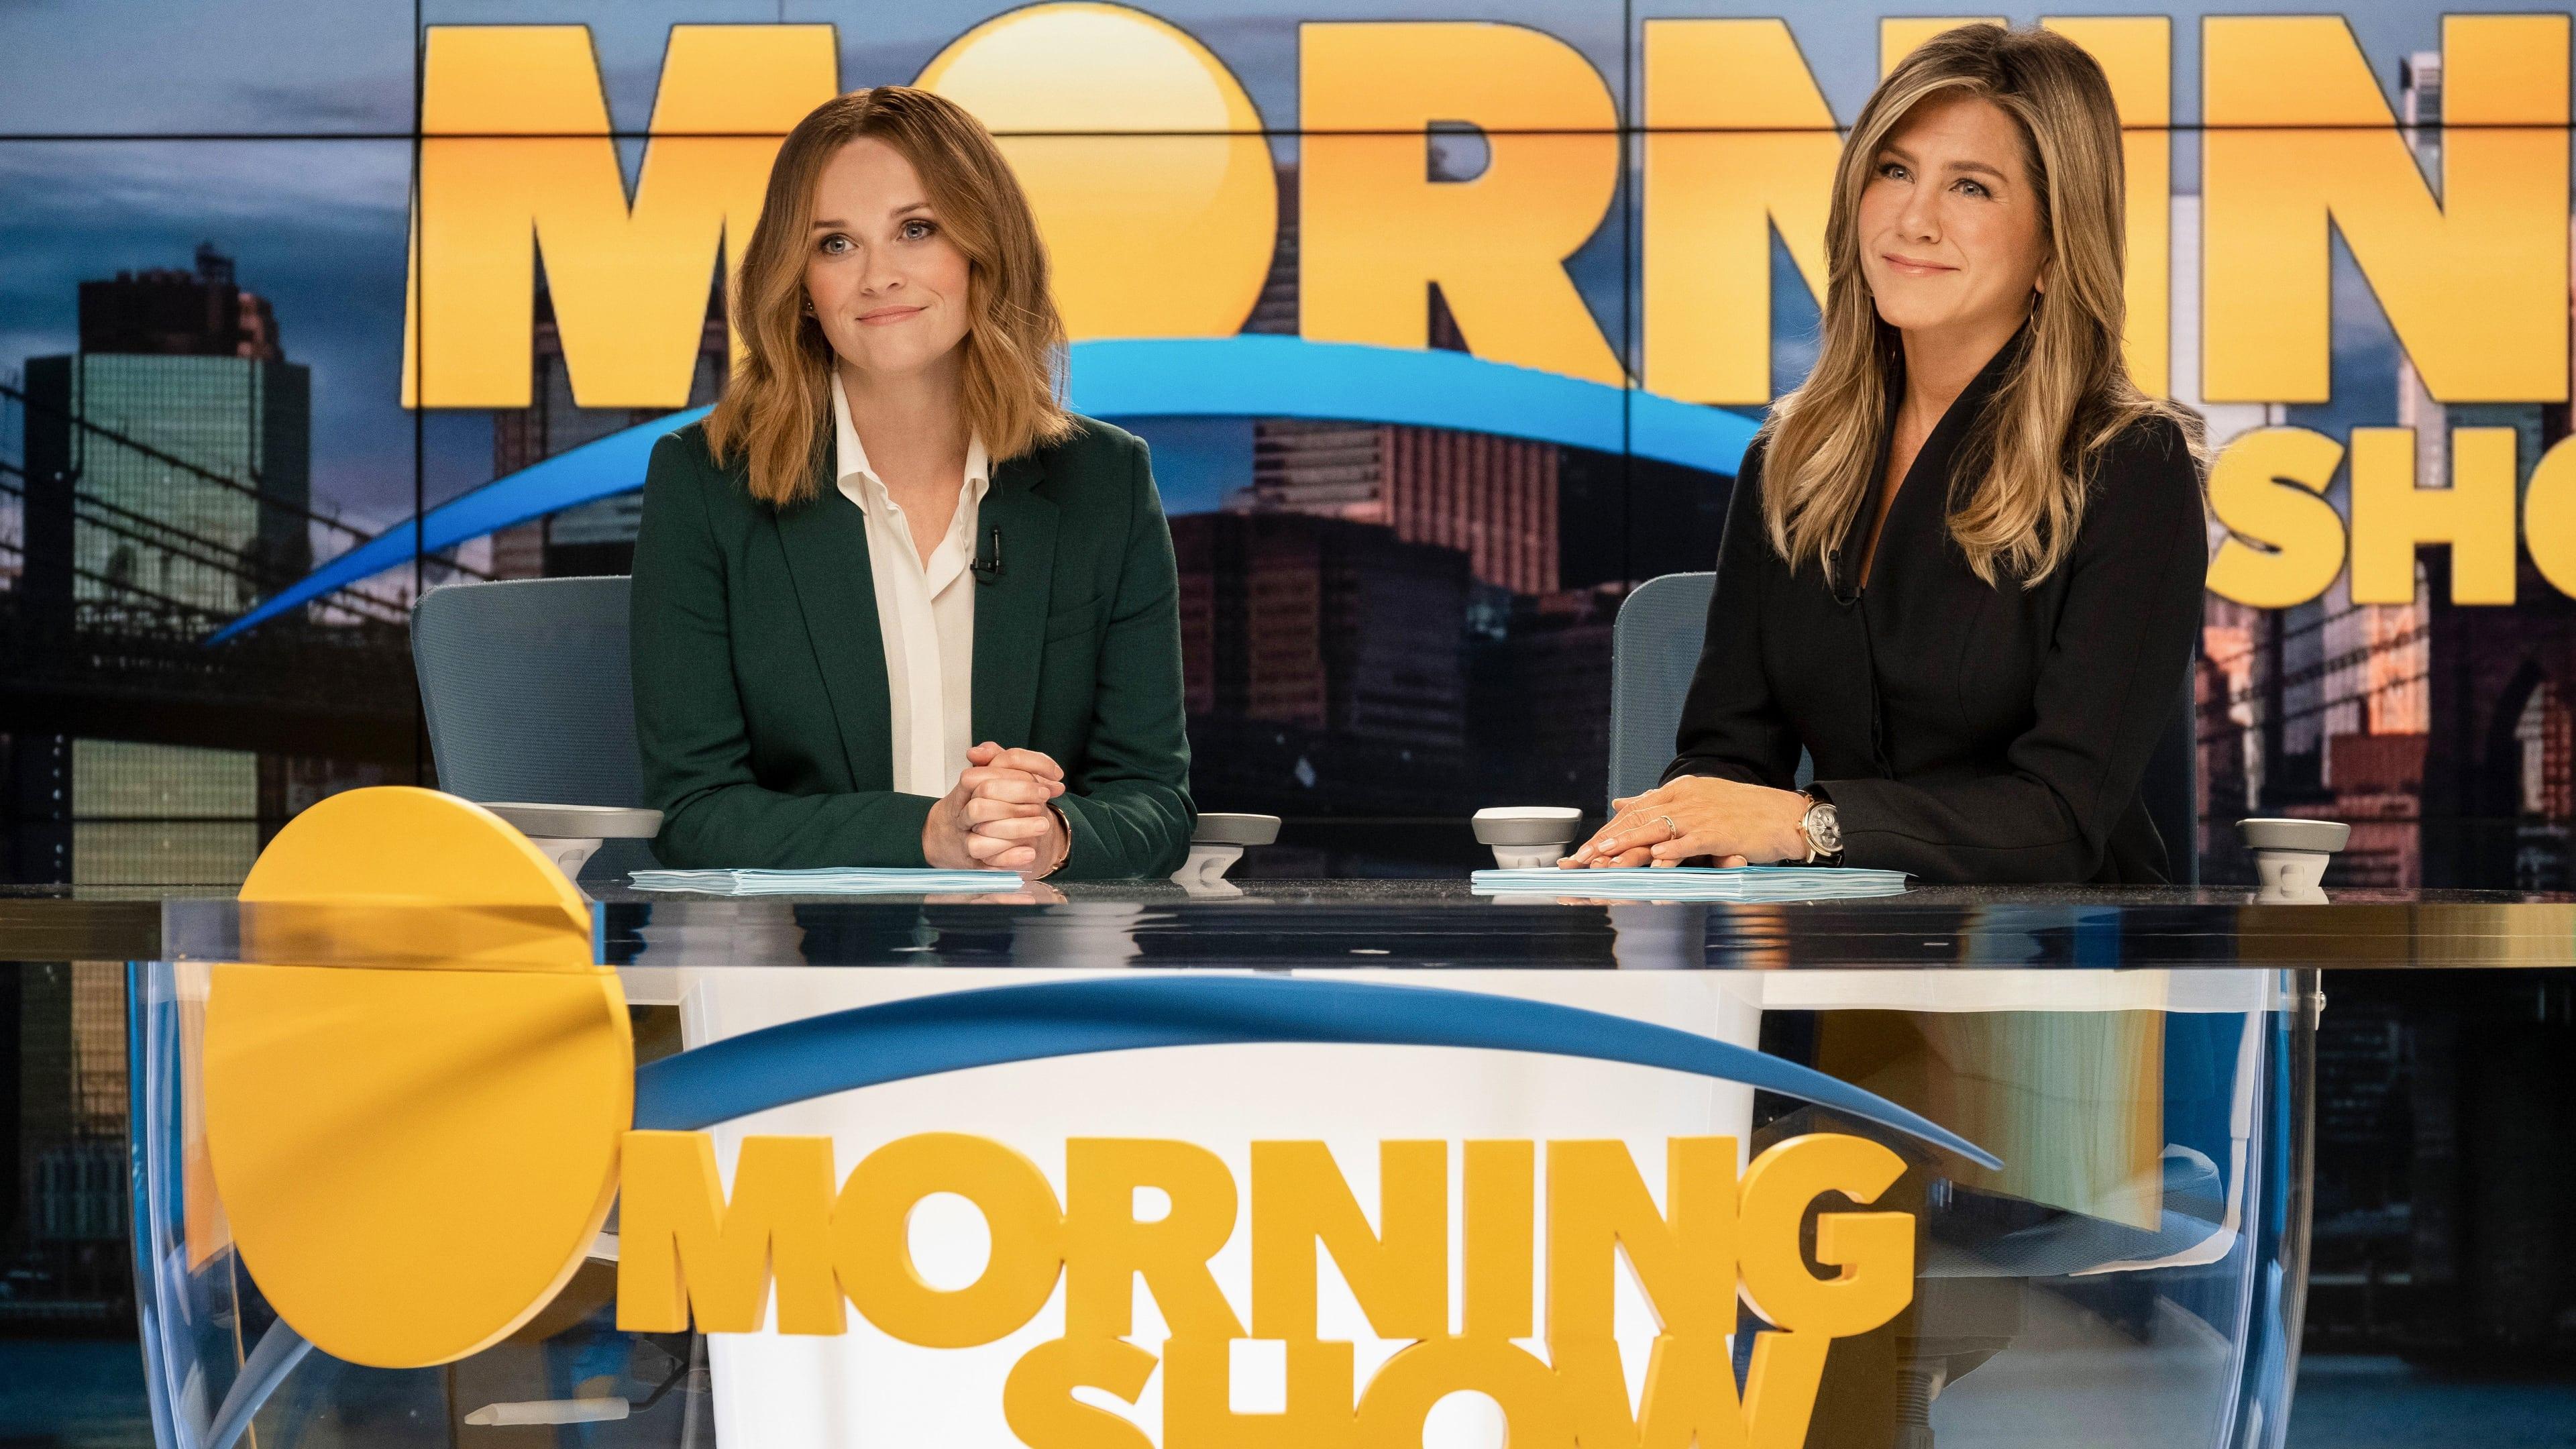 The Morning Show - Season 1 Episode 4 : That Woman